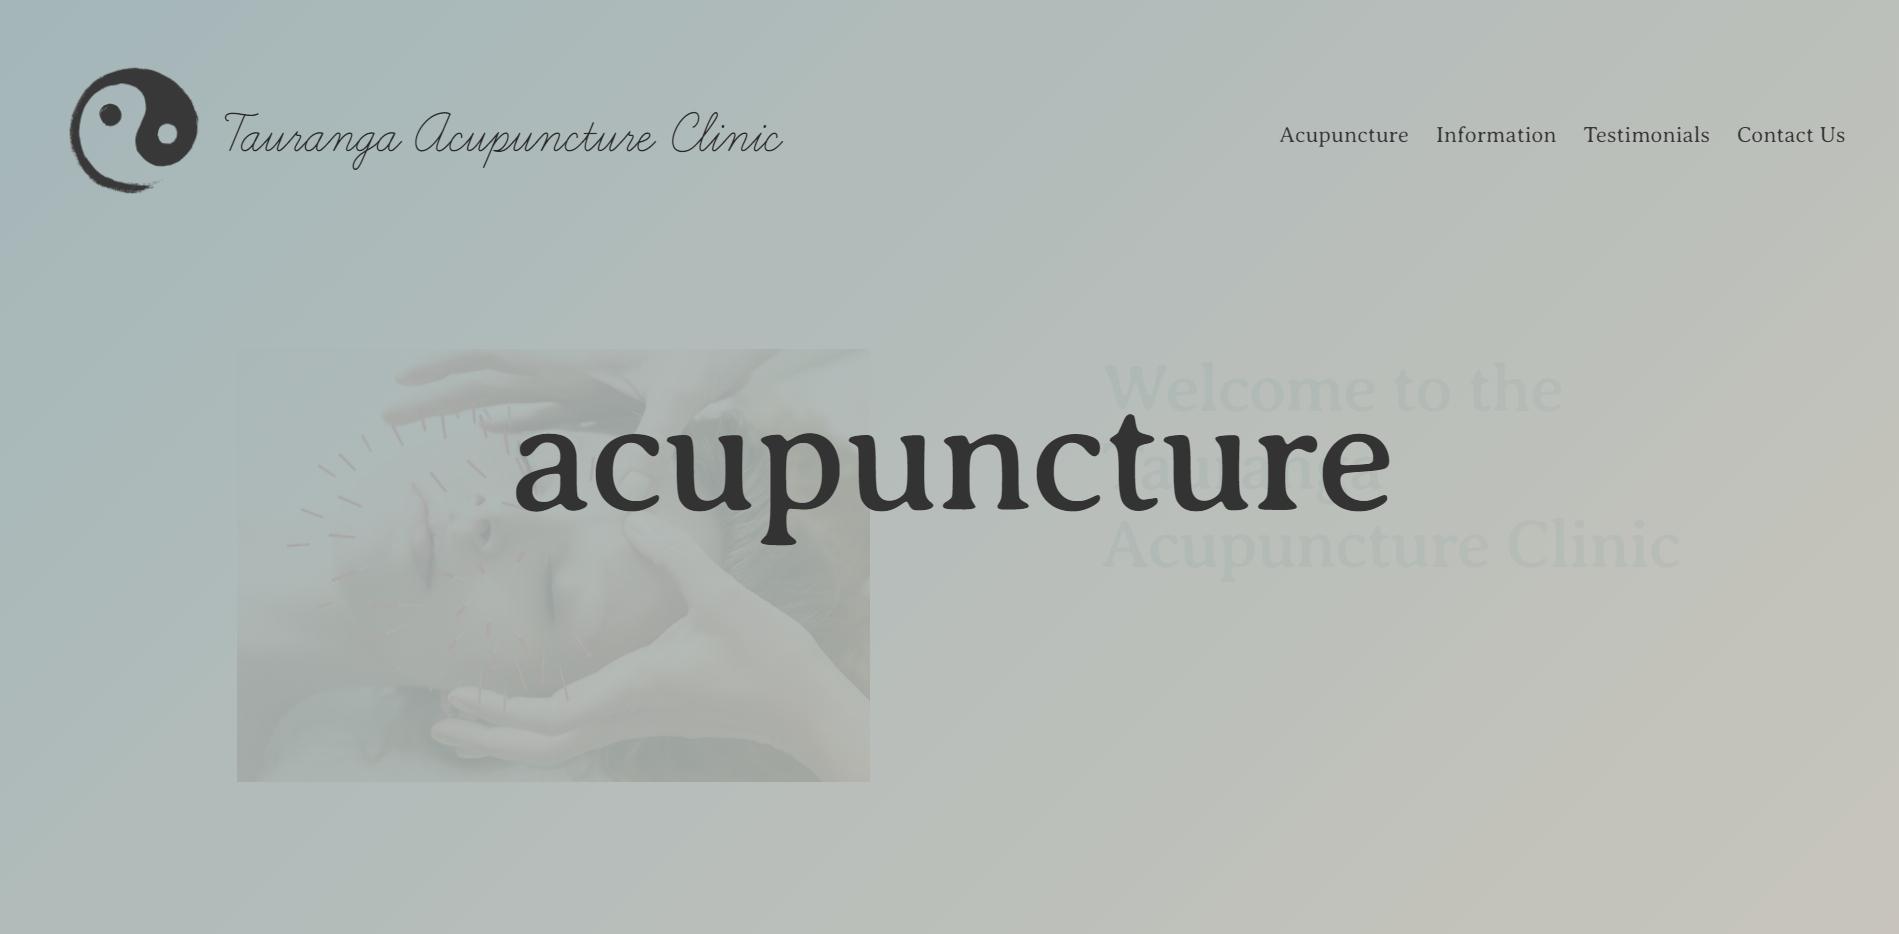 acupuncture portfolio website scrolling site.PNG